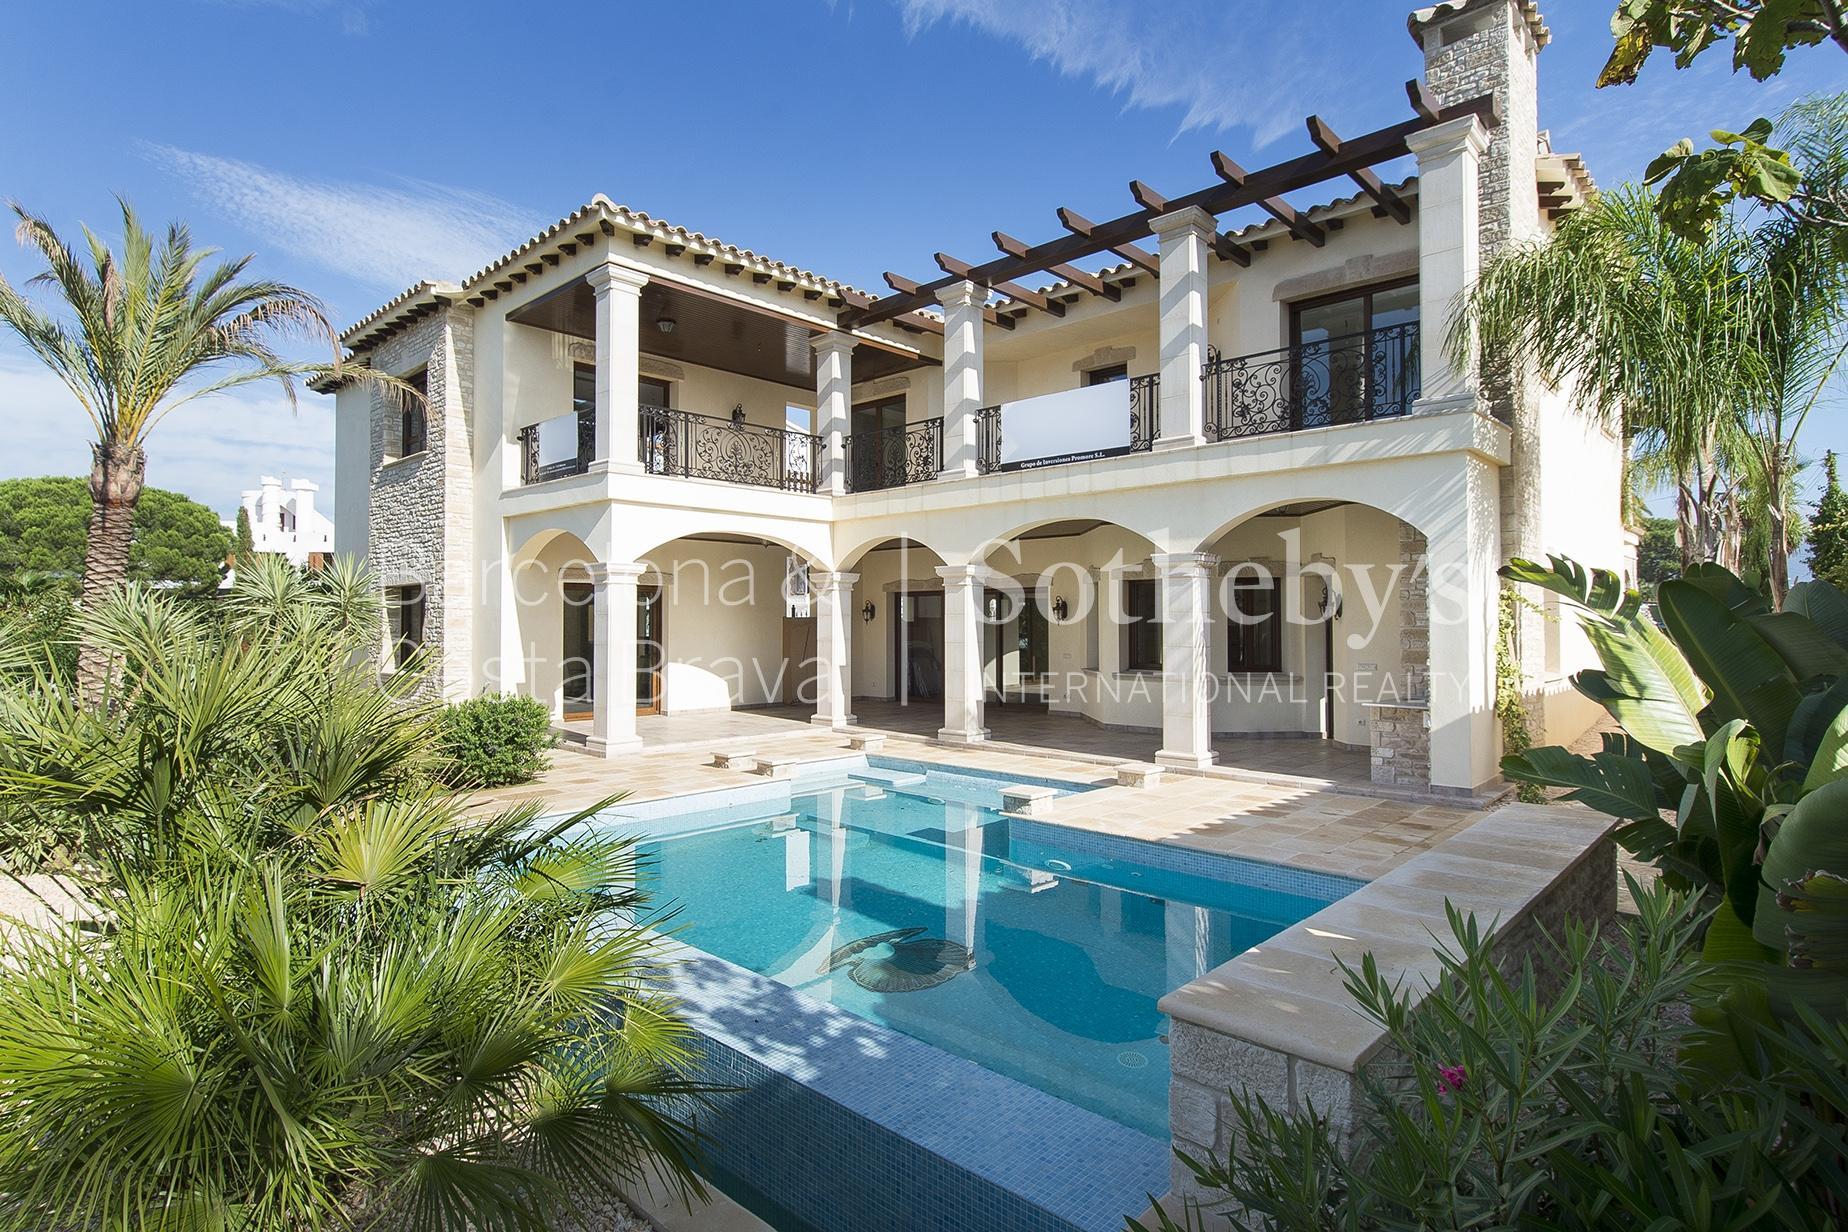 Single Family Home for Sale at Luxury villa on the canal of Empuriabrava Empuriabrava, Costa Brava 17487 Spain